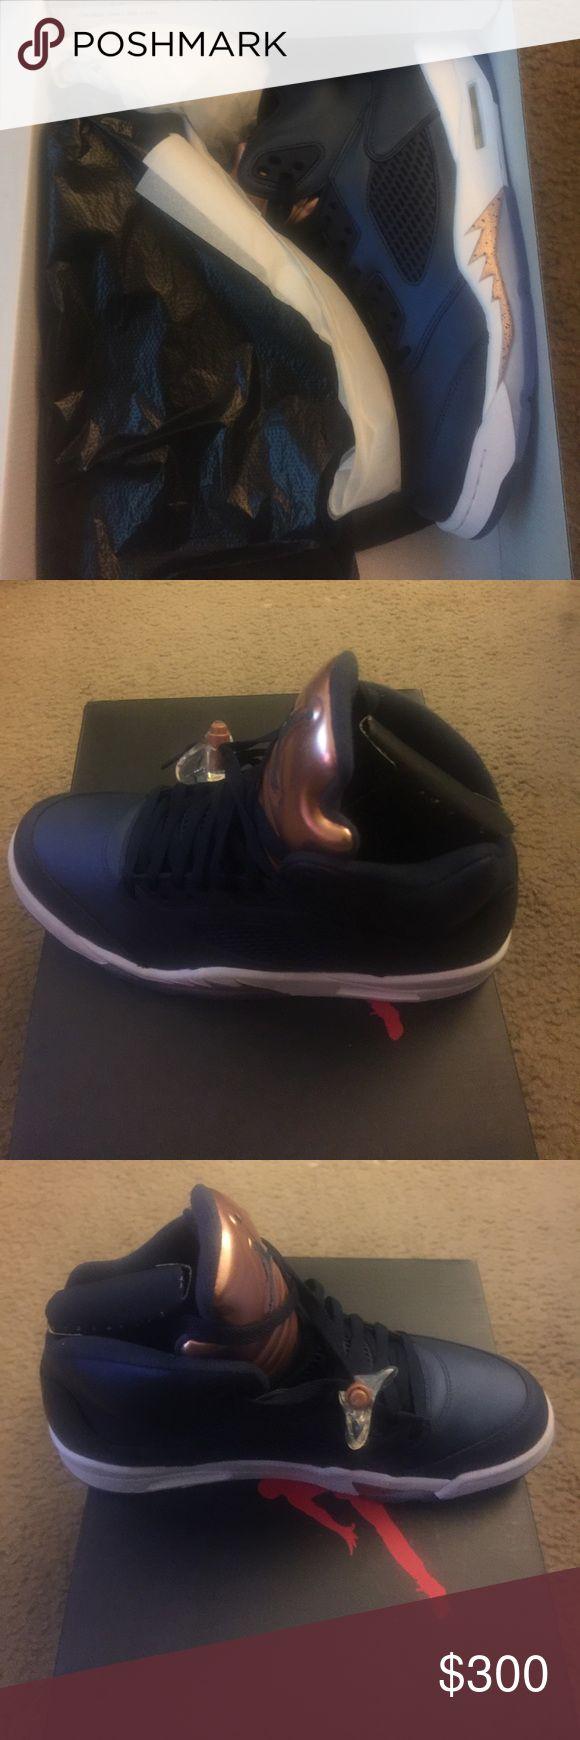 Brand New retro Jordan's in the Box ! Navy Blue and Gold Retro Jordan's Jordan Shoes Sneakers